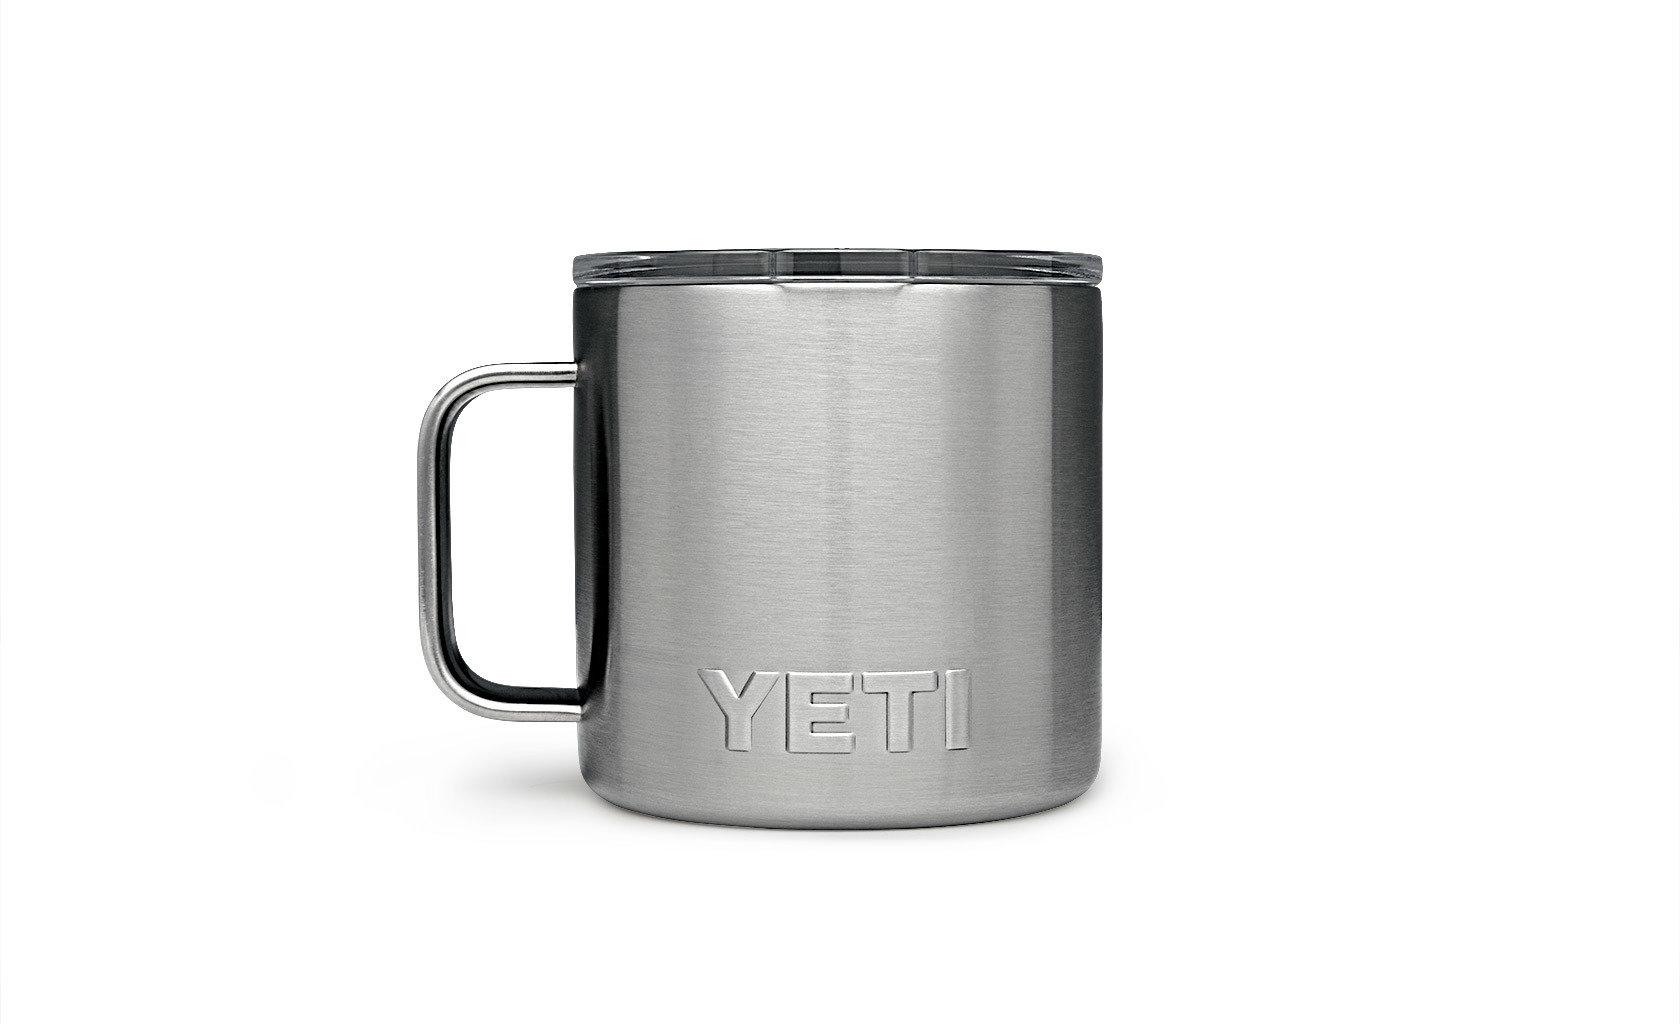 Yeti Rambler Mug 14 oz JR1yemug14o